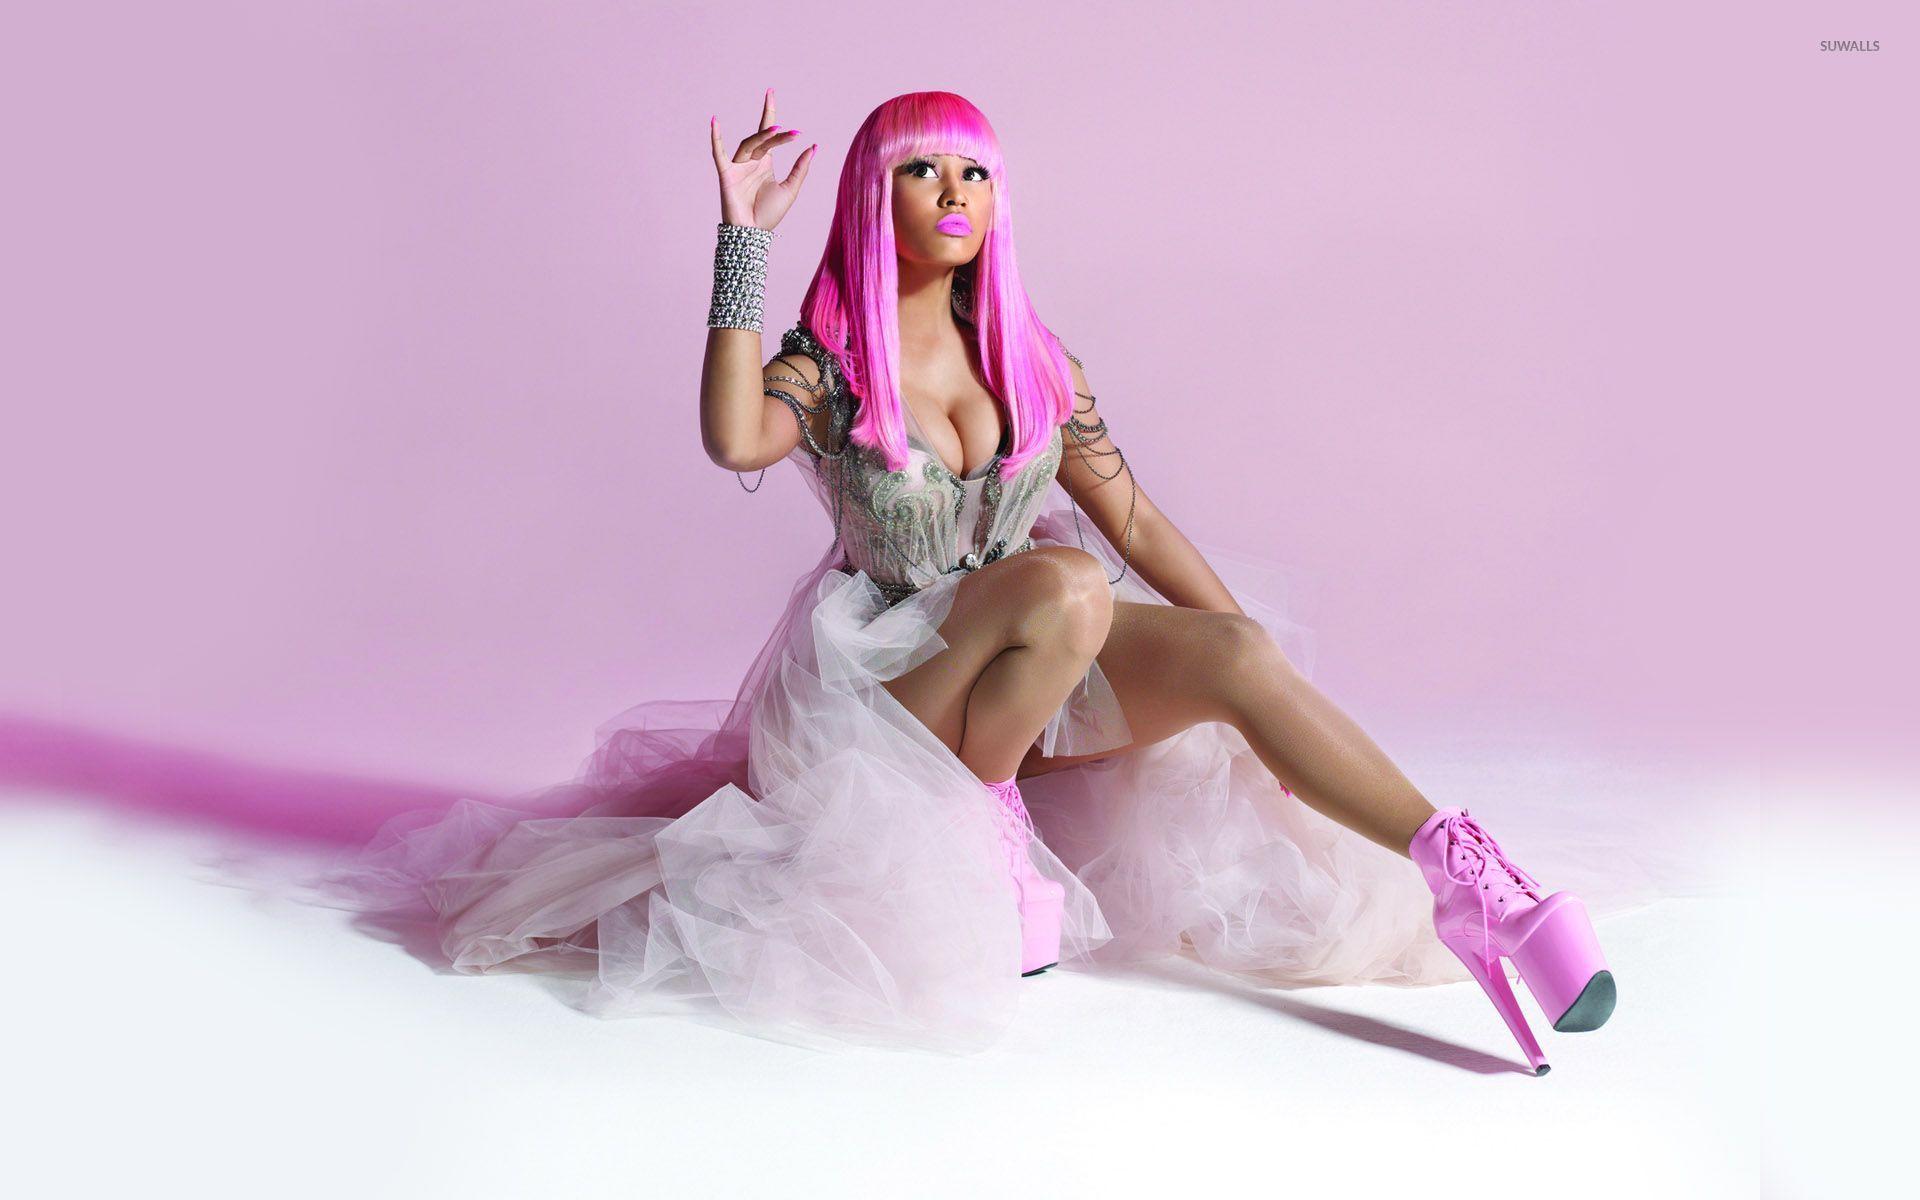 Nicki Minaj Wallpaper Celebrity Wallpapers 27658